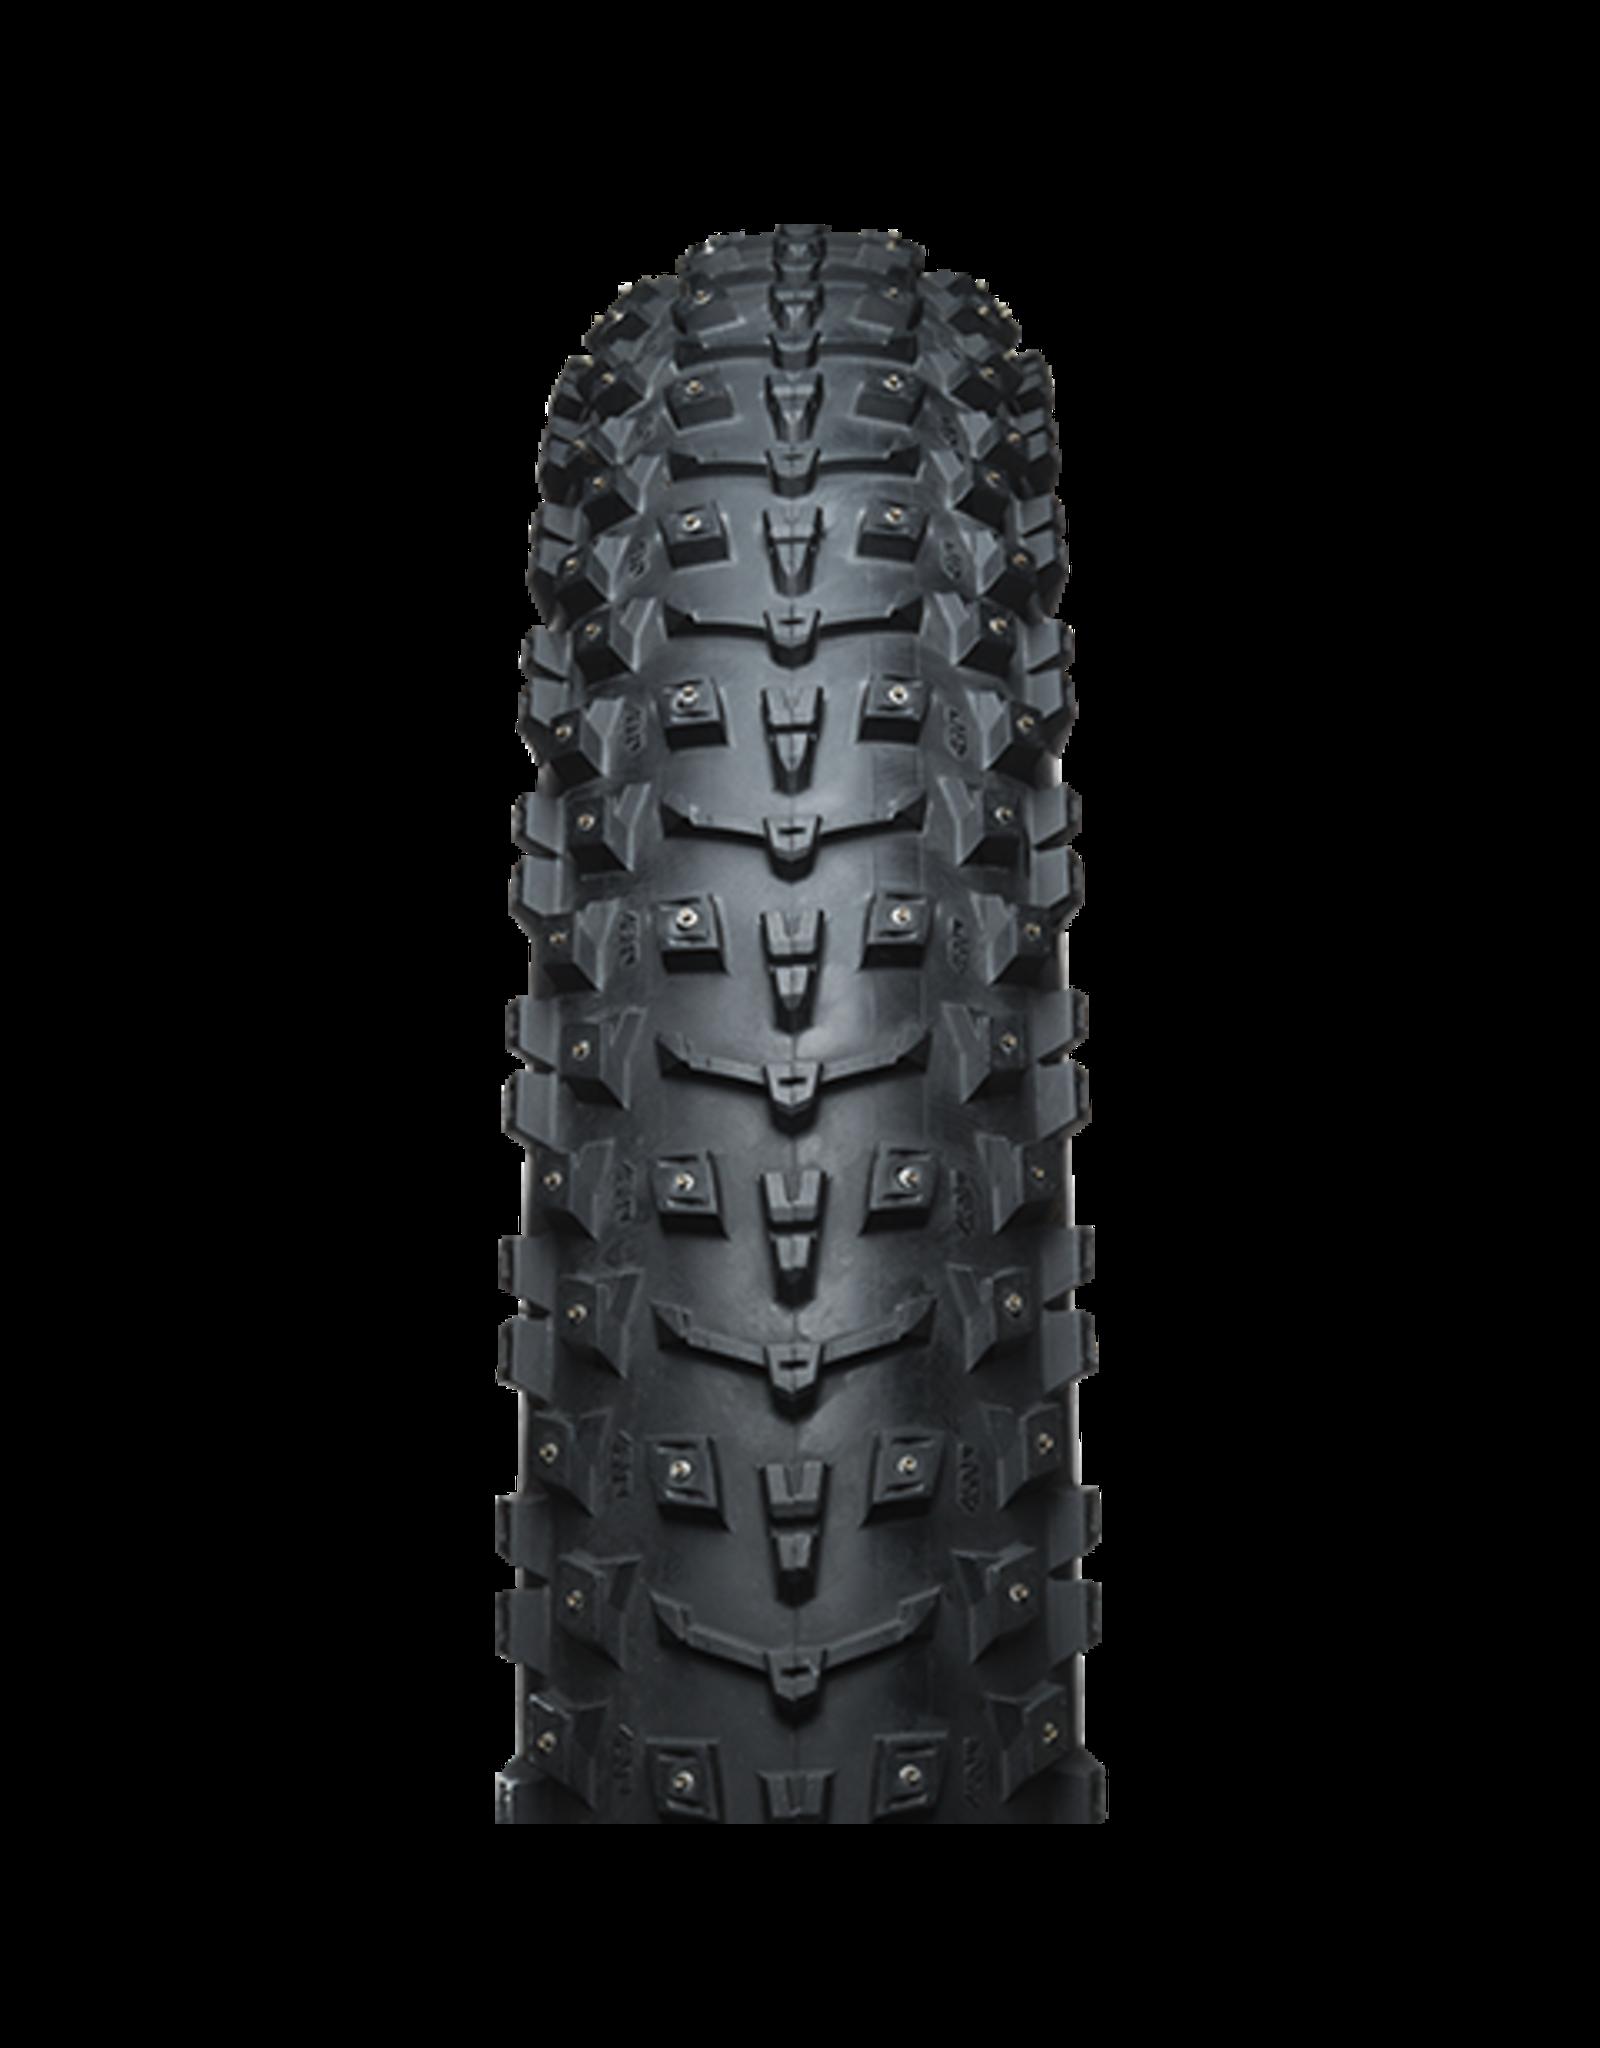 45NRTH 27.5x4.5 Dillinger 5 45NRTH Tire, TR Folding, Black, 120tpi, 252 Concave Carbide Aluminum Studs